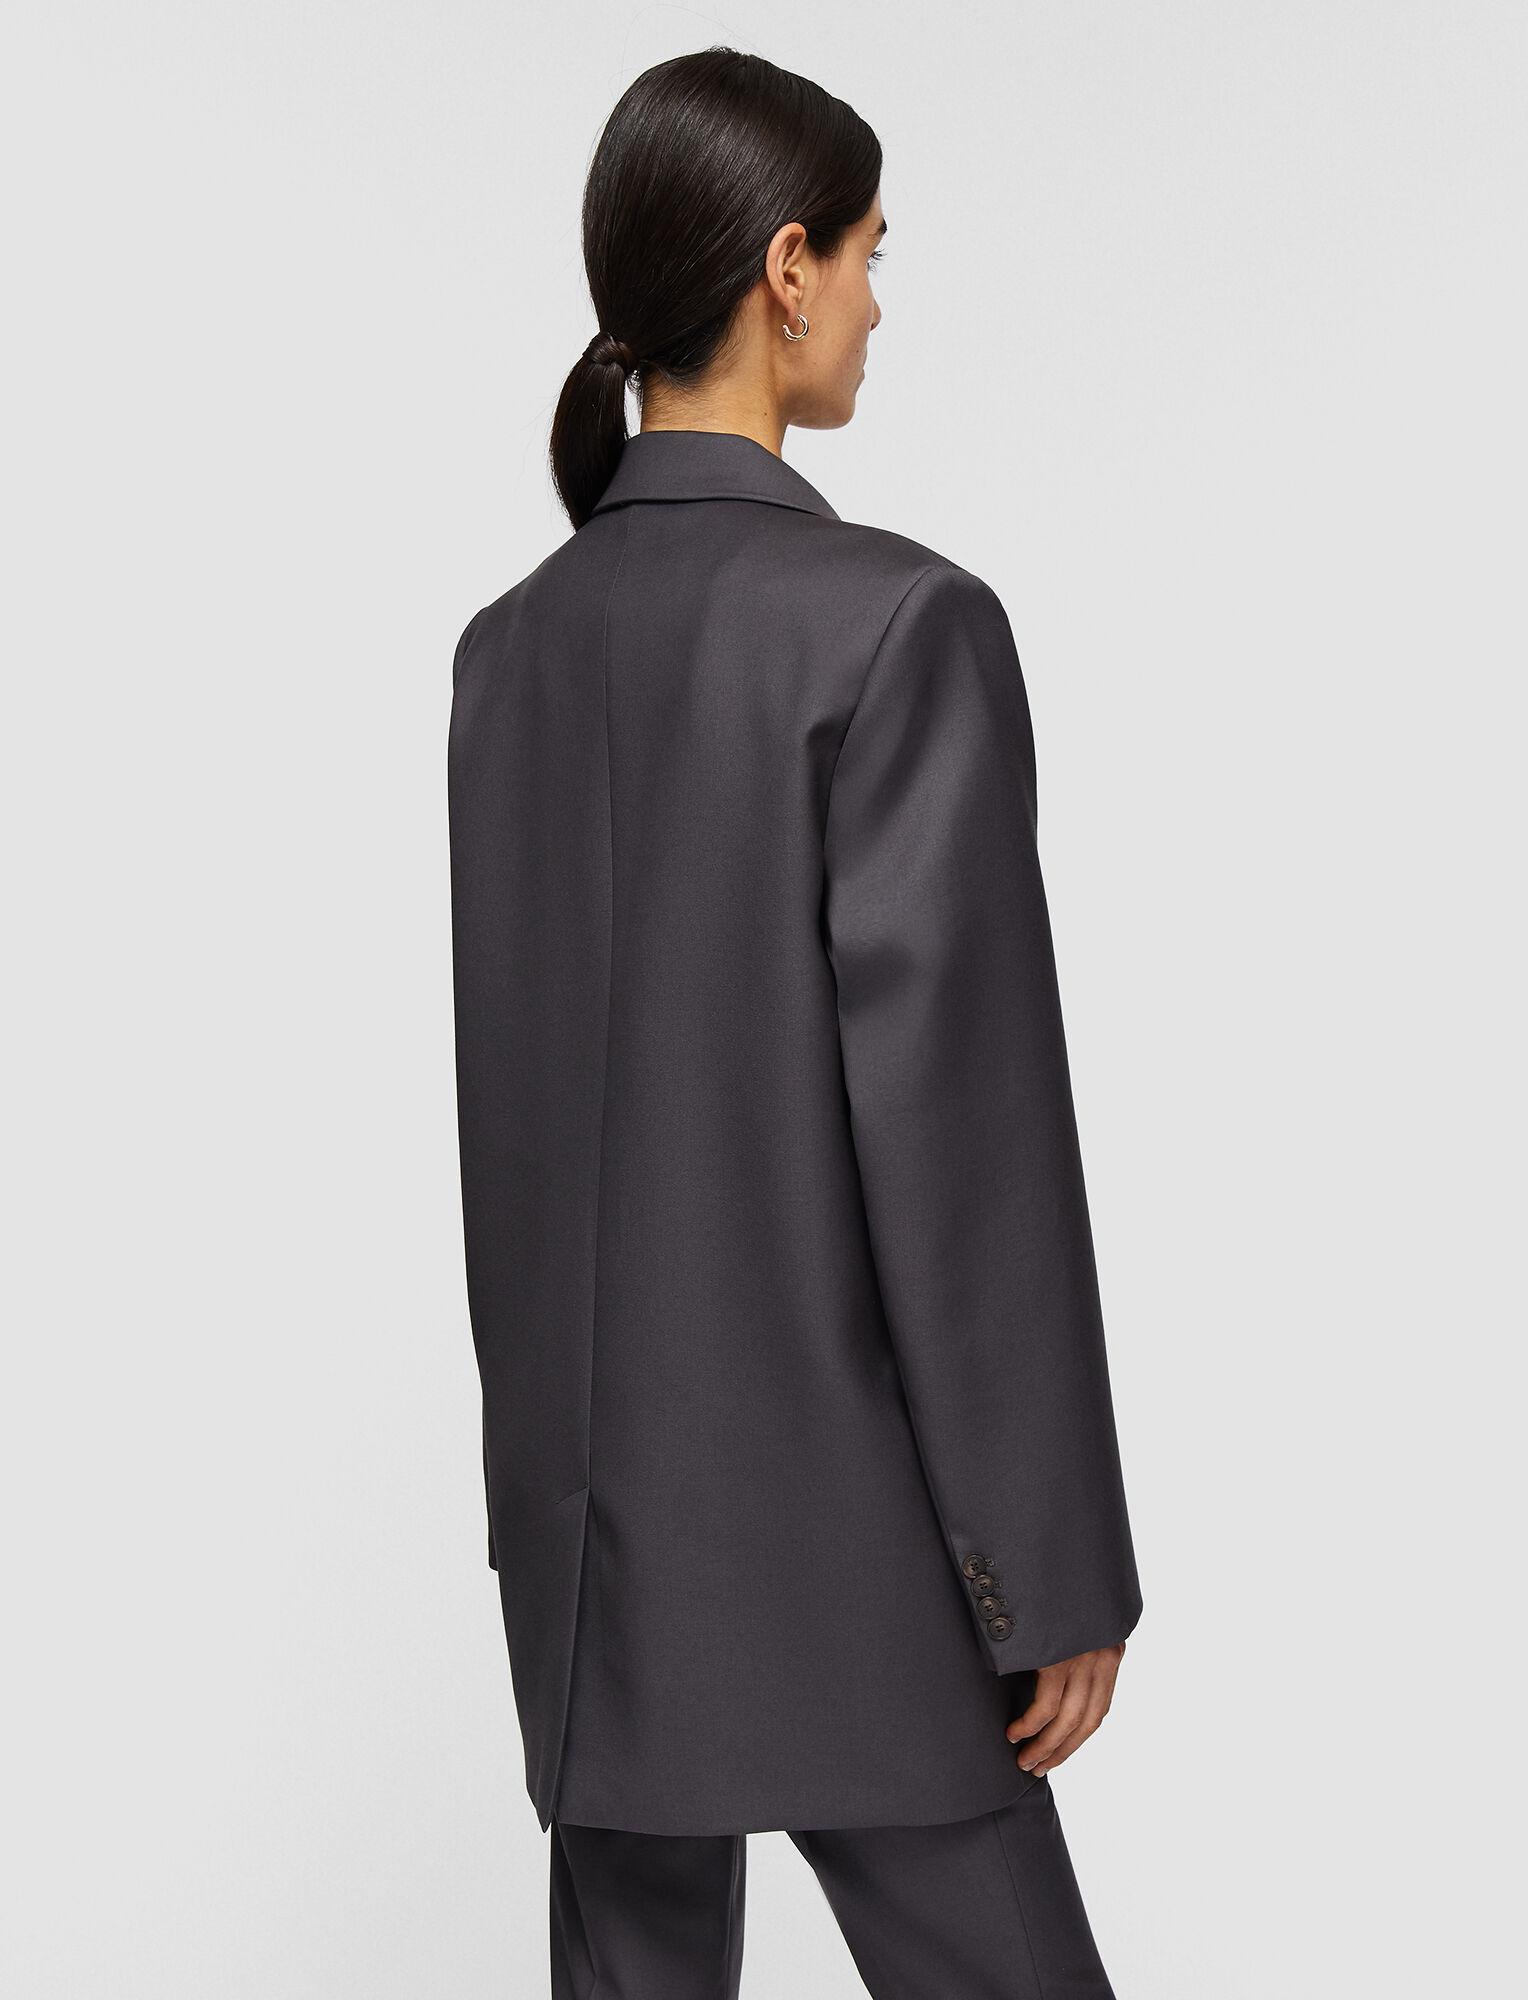 Joseph, Tailoring Wool Joni Jacket, in IRON